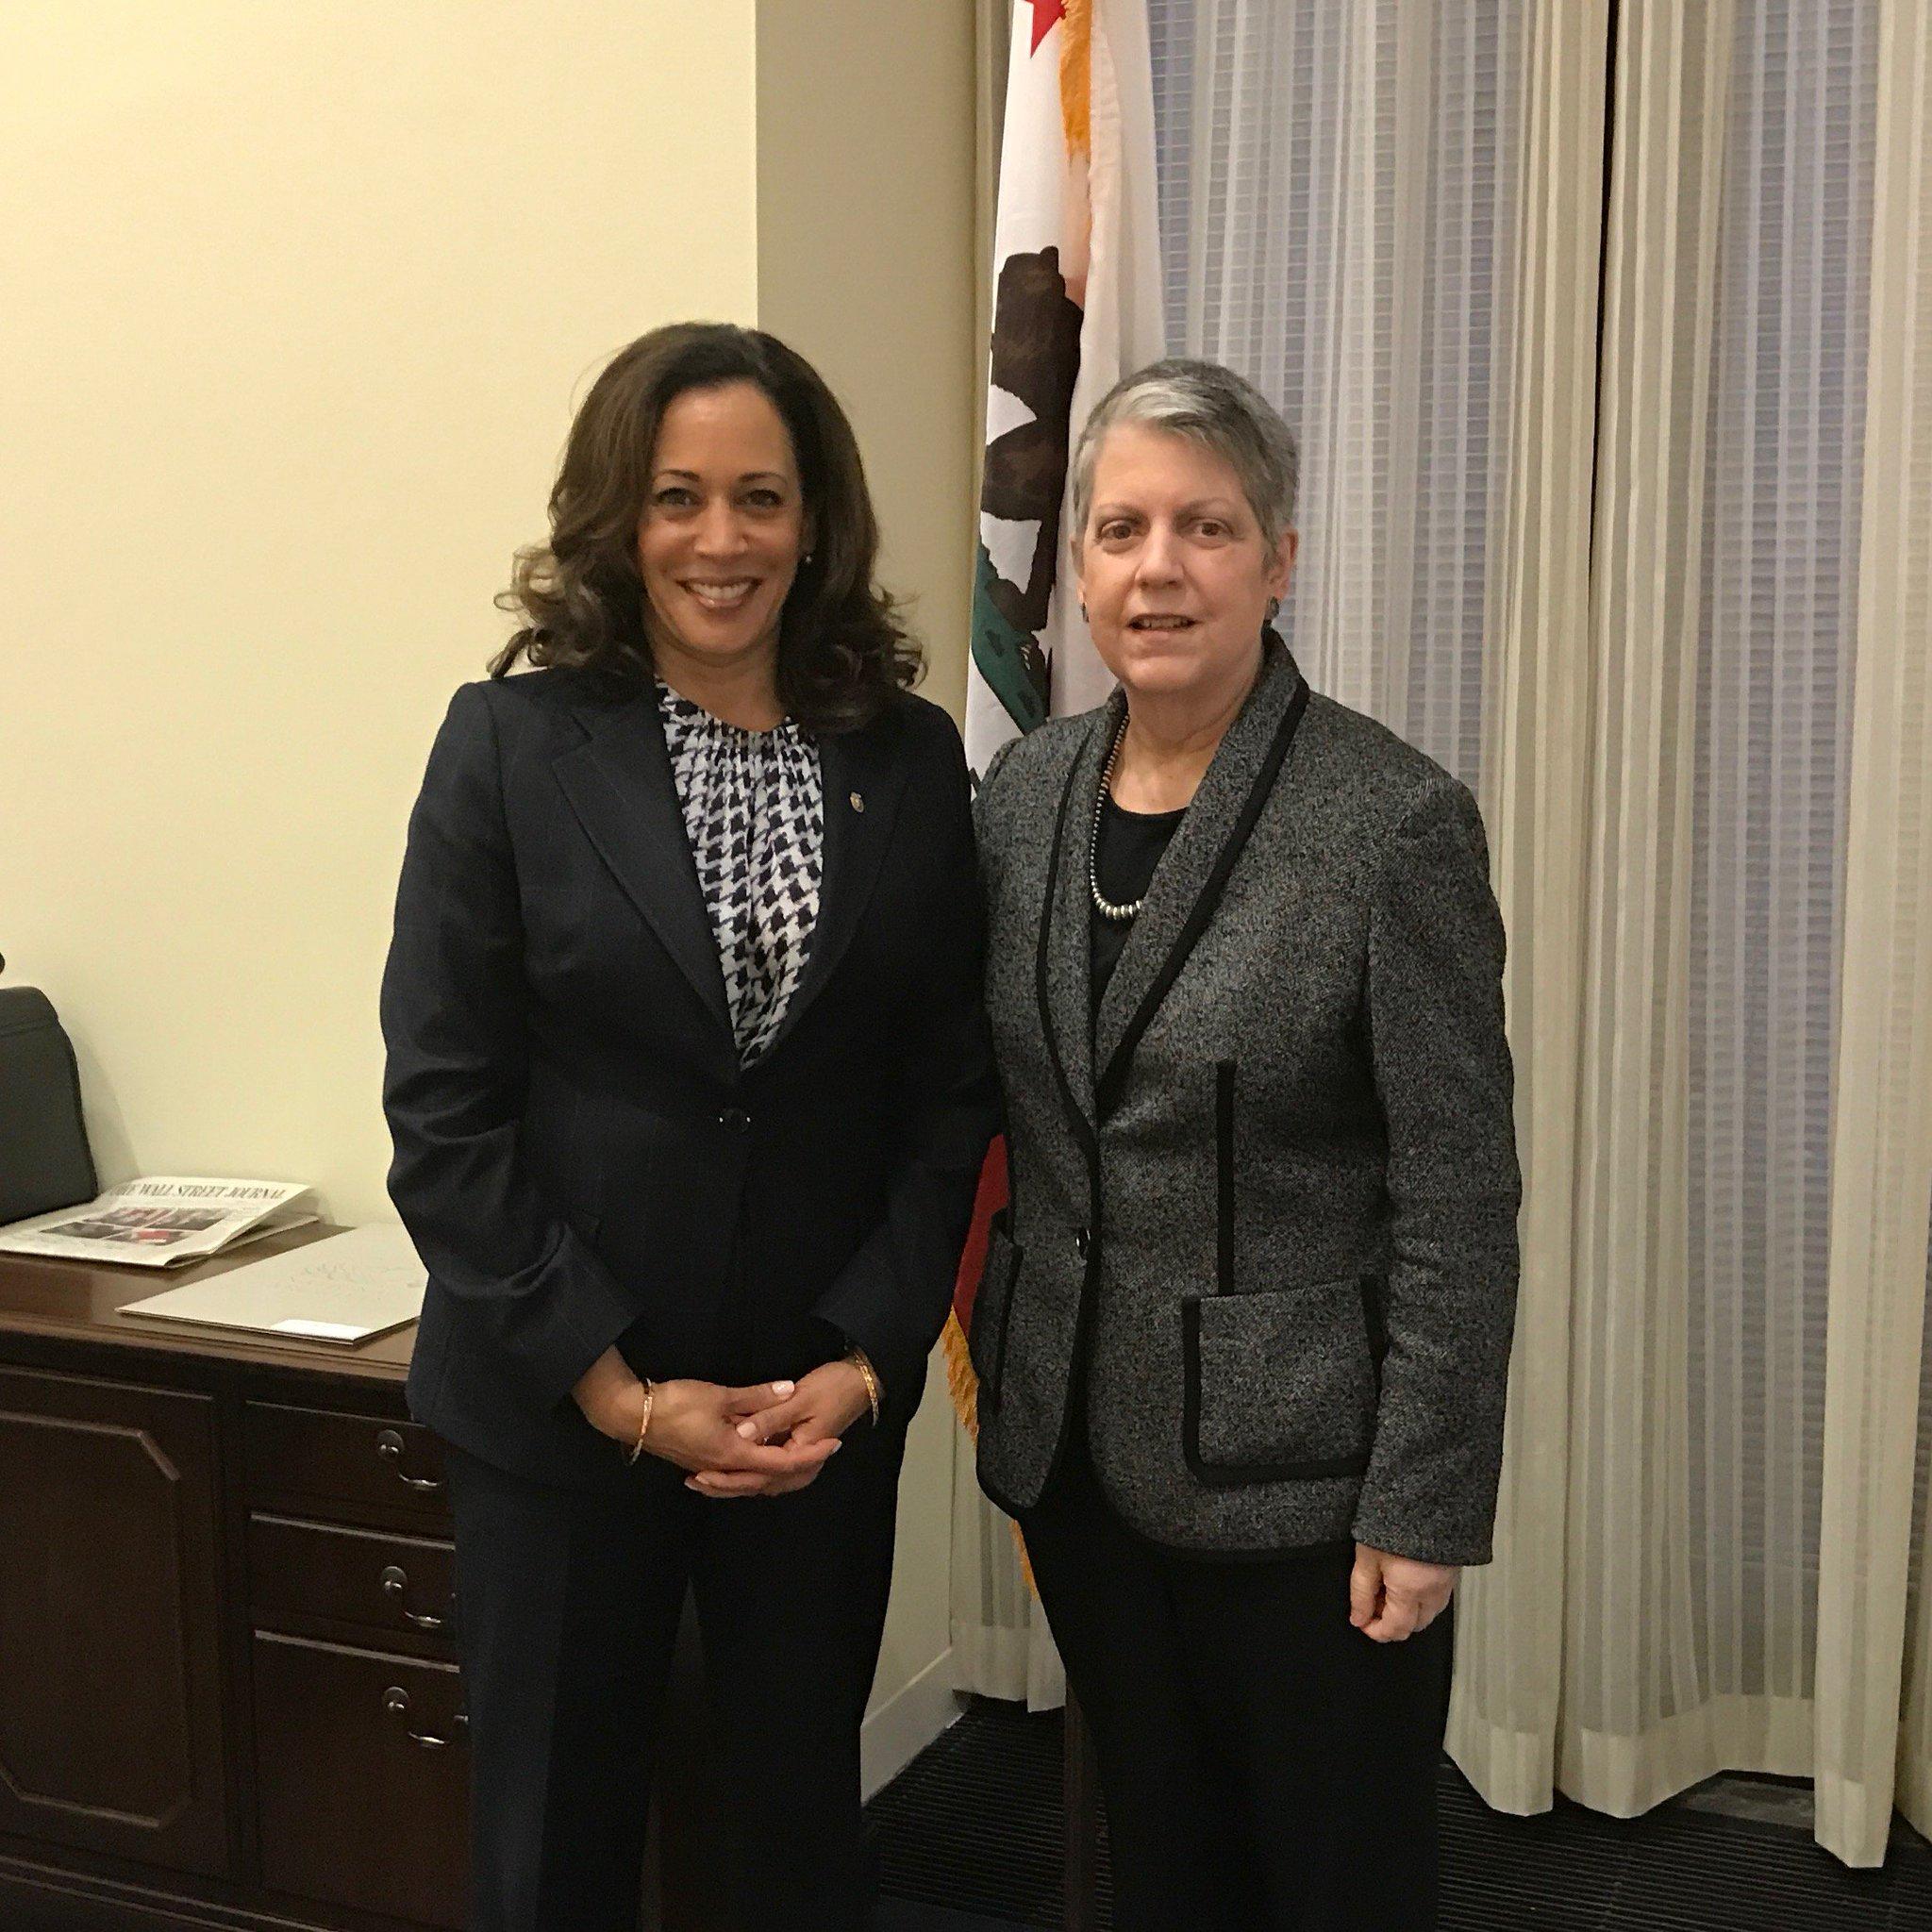 File Kamala Harris Hosts Janet Napolitana In Her Senate Office C53ejl Xqaeqbd6 Jpg Large Jpg Wikimedia Commons